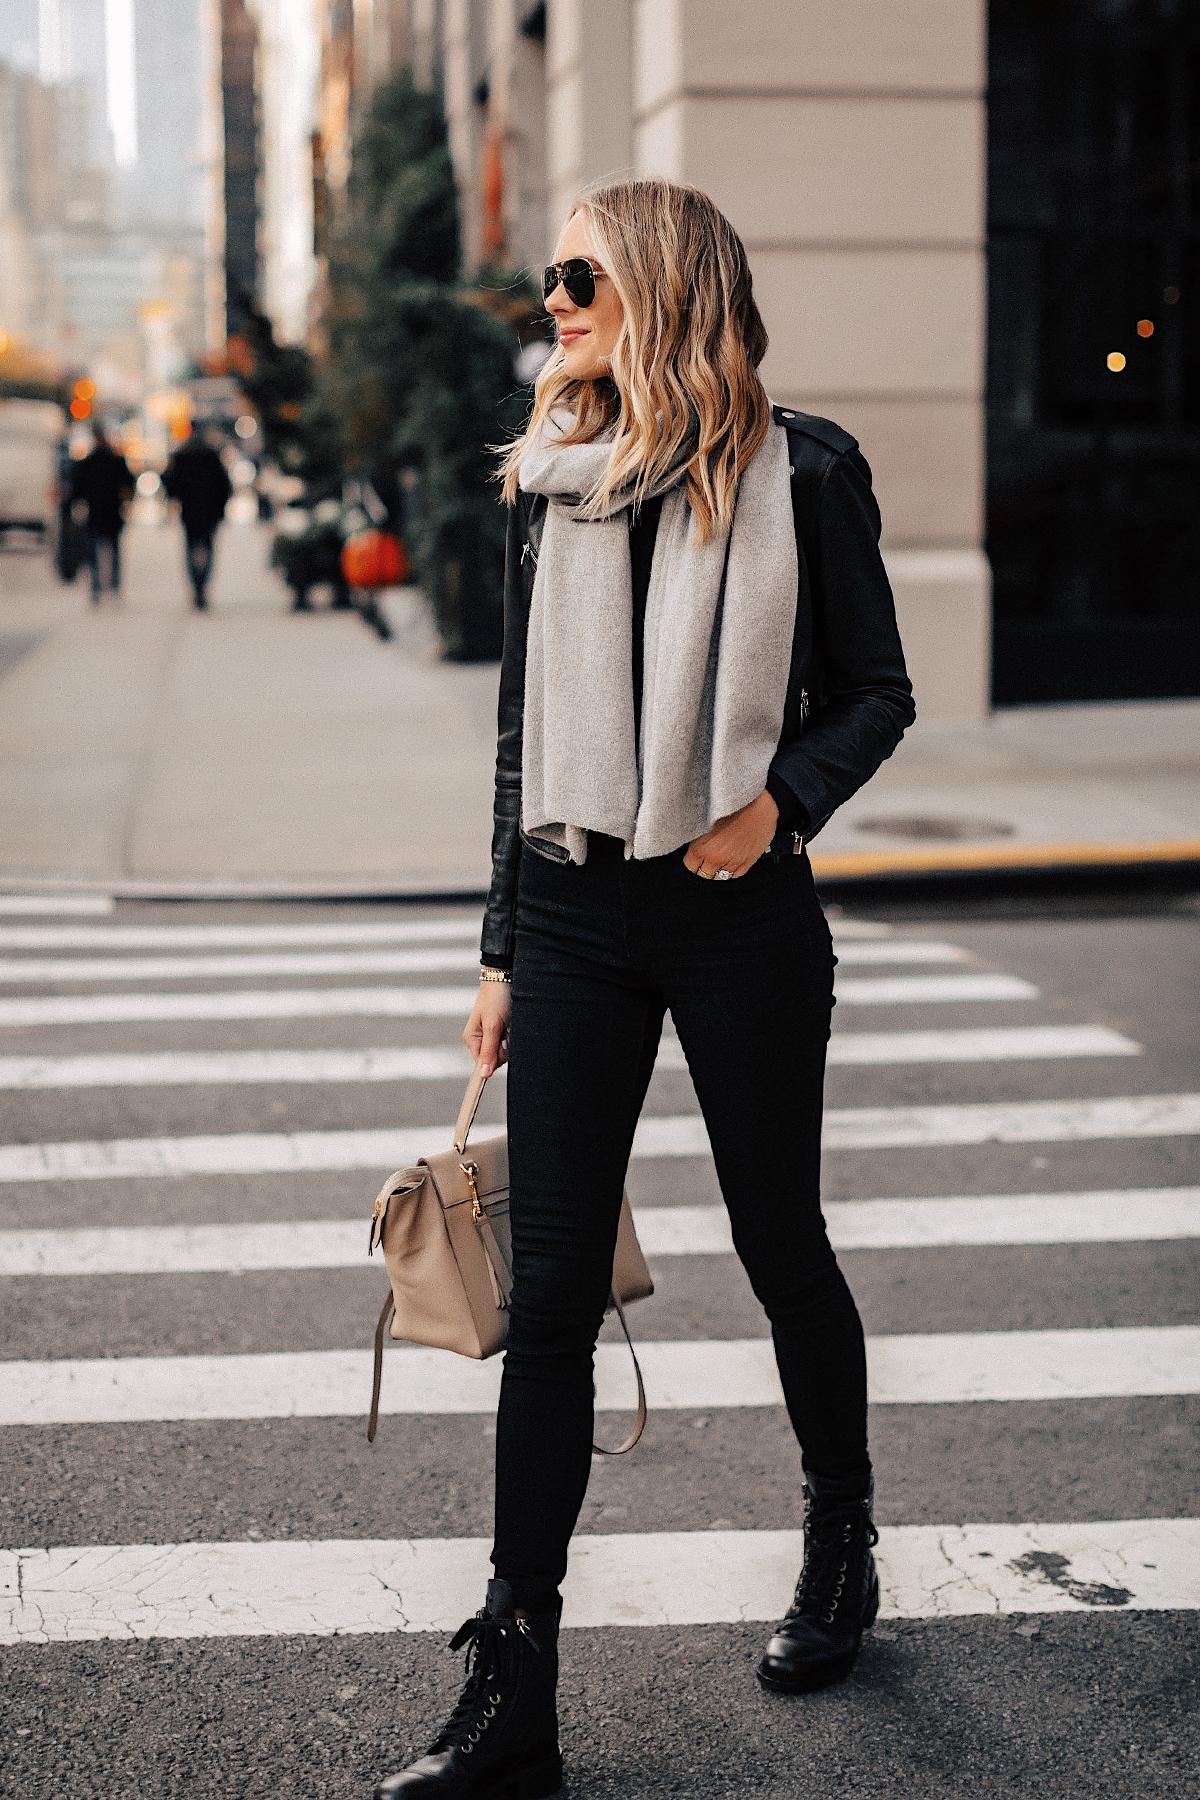 Fashion Jackson Wearing Black Leather Jacket Black Skinny Jeans Chanel Combat Boots Grey Scarf New York City Street Style